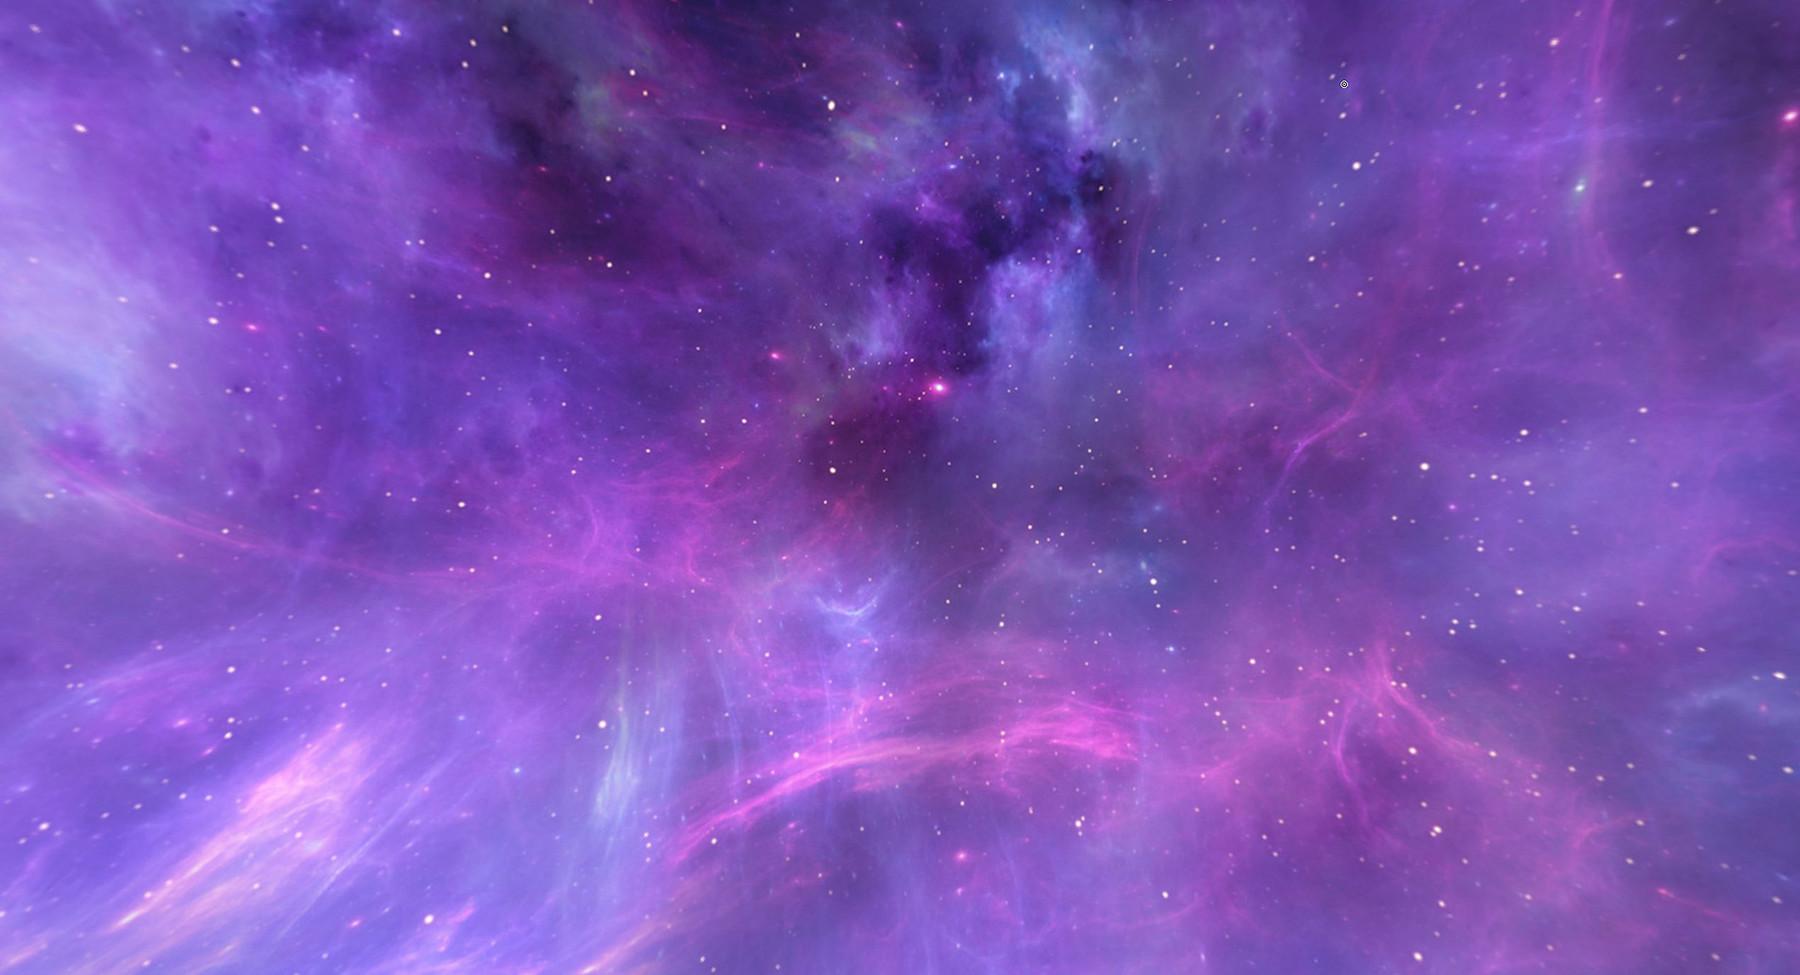 SPACE HDRI + SKYBOX - Vol  1